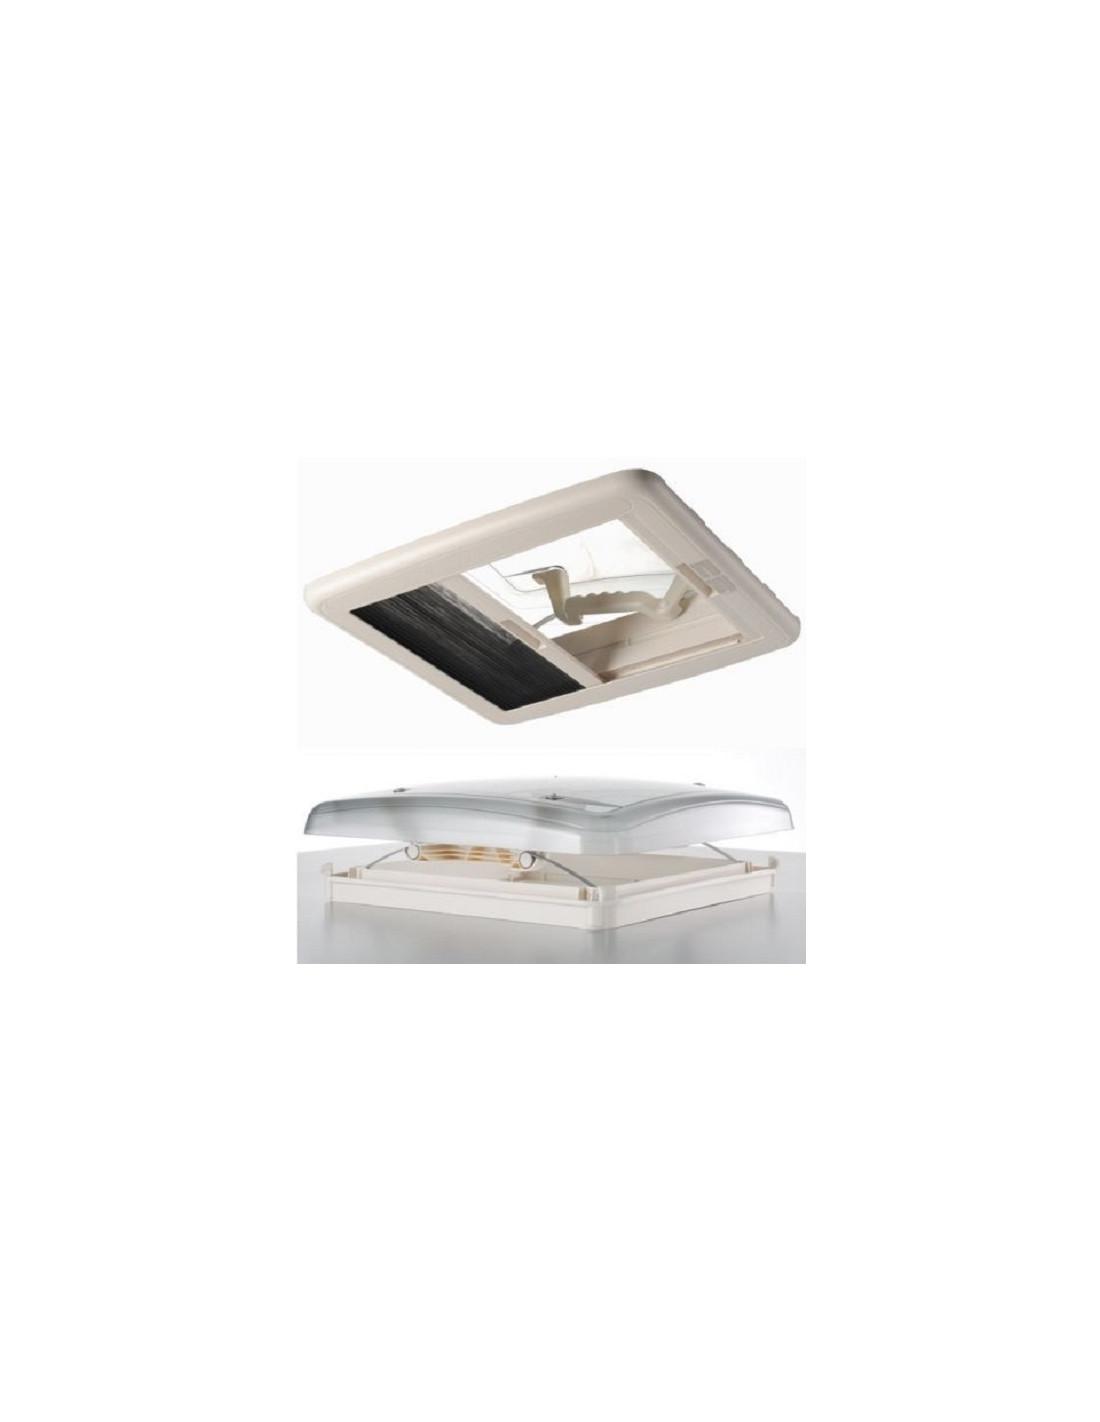 claraboya seitz mini heki s para grosor de pared de 23. Black Bedroom Furniture Sets. Home Design Ideas